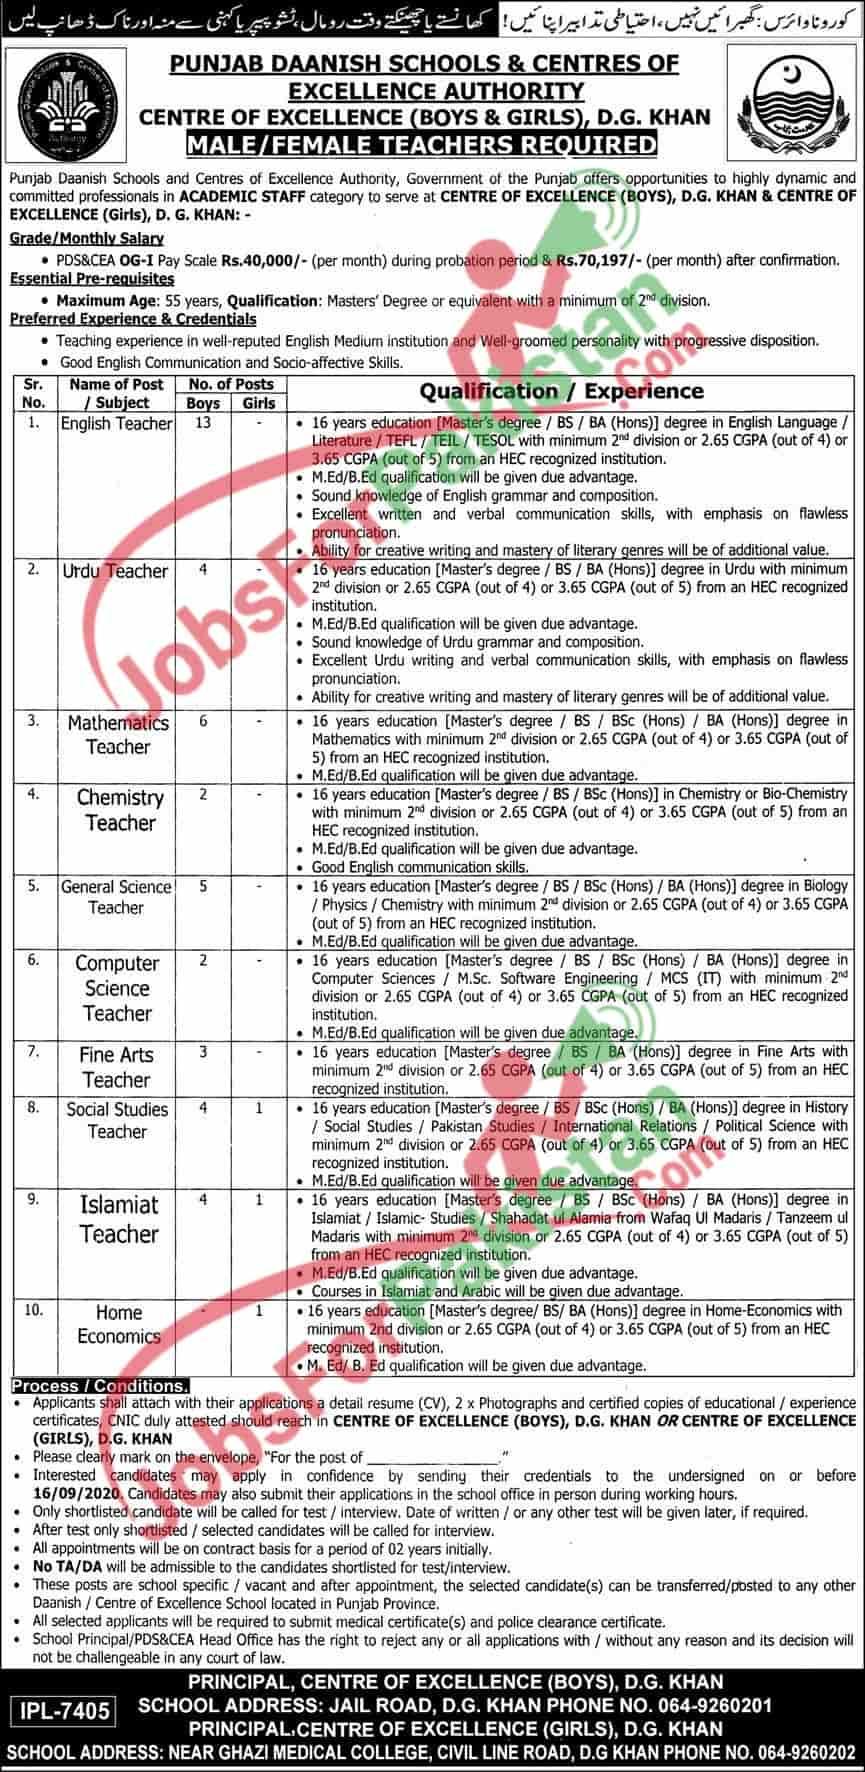 Punjab Daanish School Jobs 2020 application form